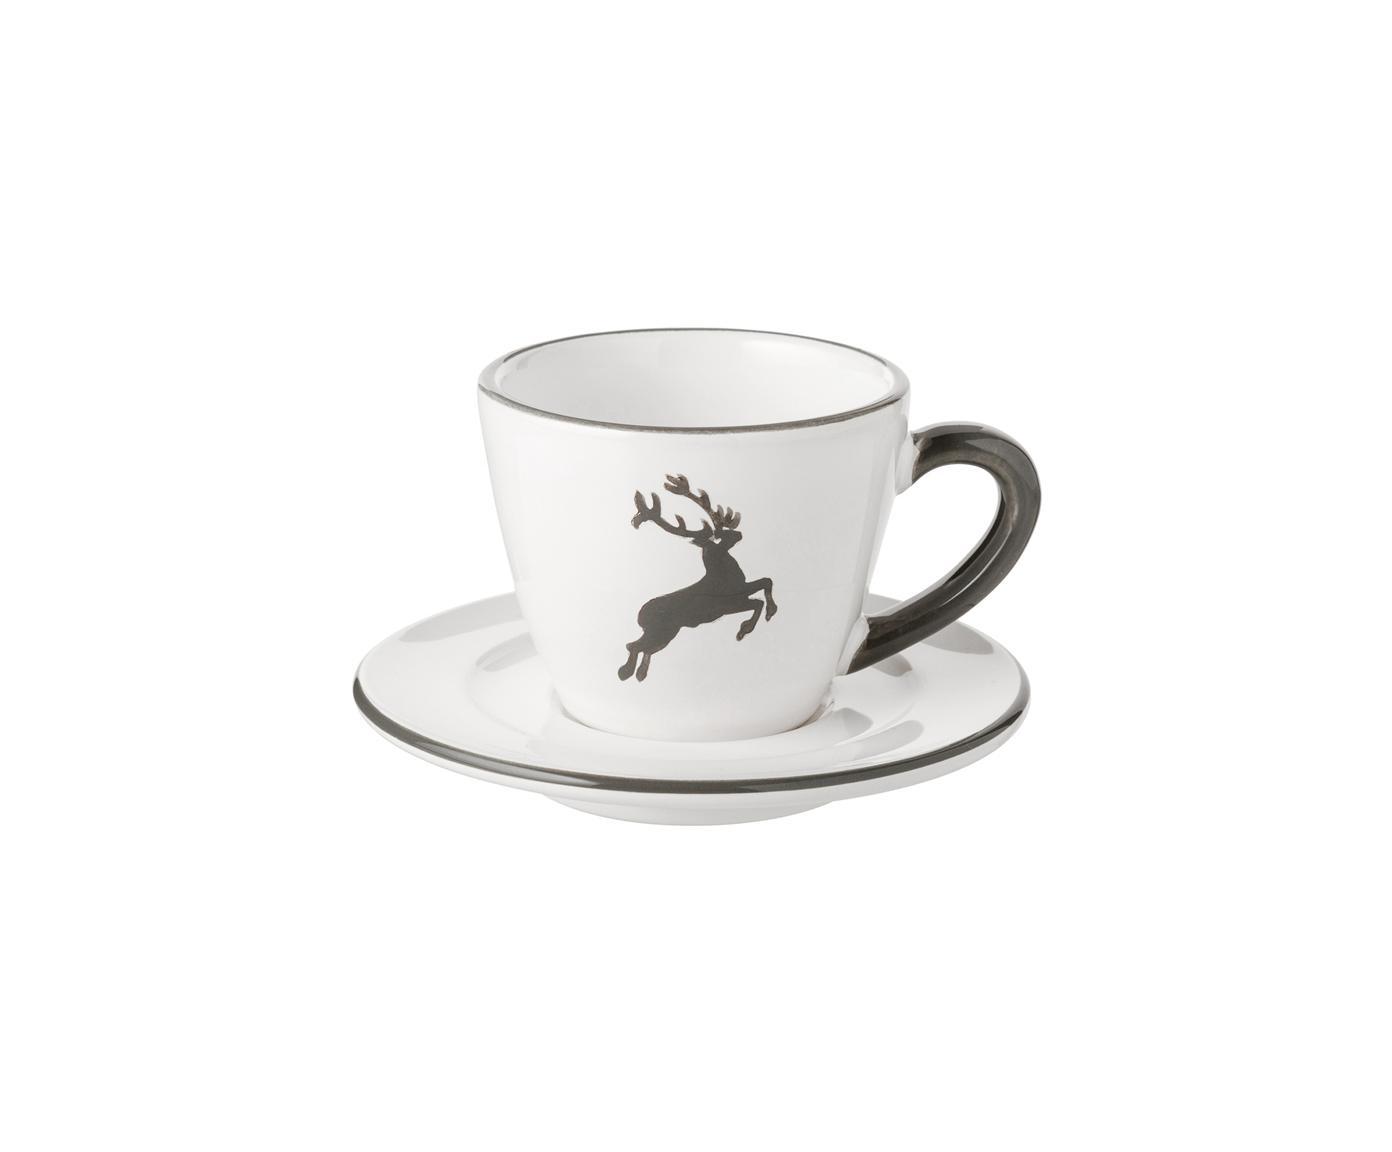 Taza de café Gourmet Grauer Hirsch, 2pzas., Porcelana, Fine Bone, Gris, blanco, 60 ml